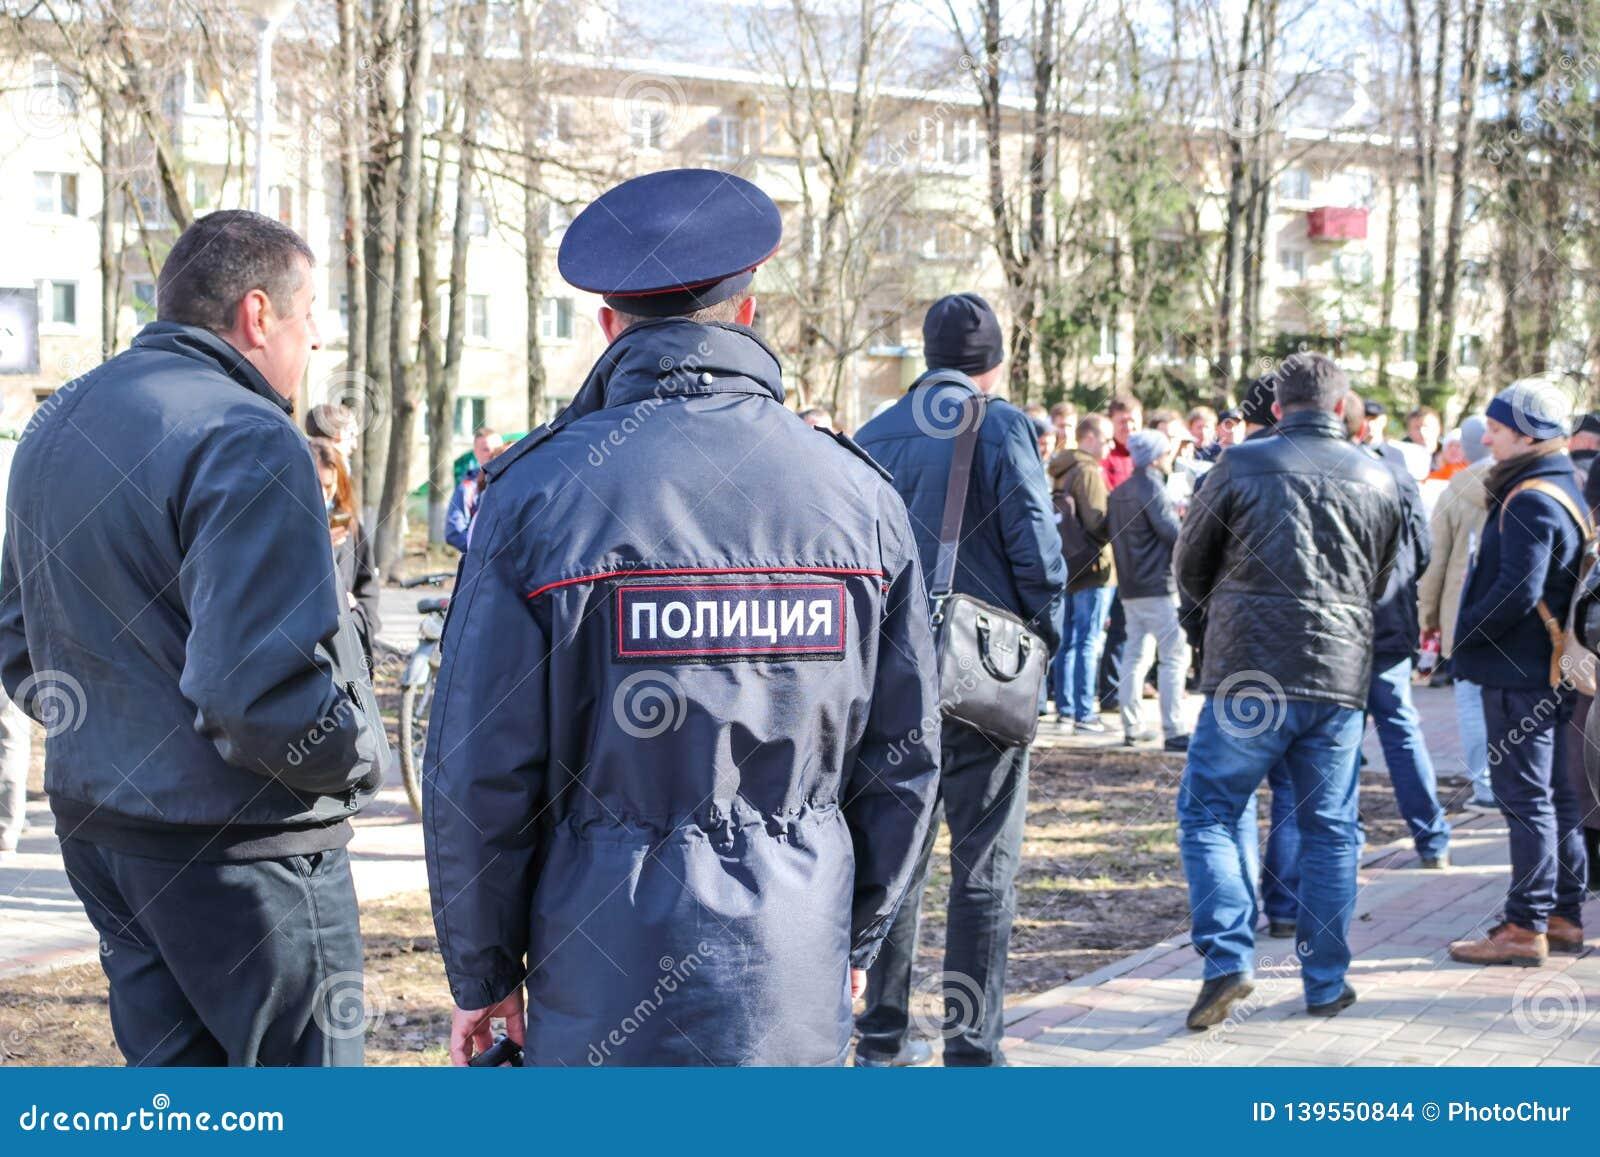 OBNINSK, RUSSLAND - 26. MÄRZ 2017: Pfosten gegen Korruption